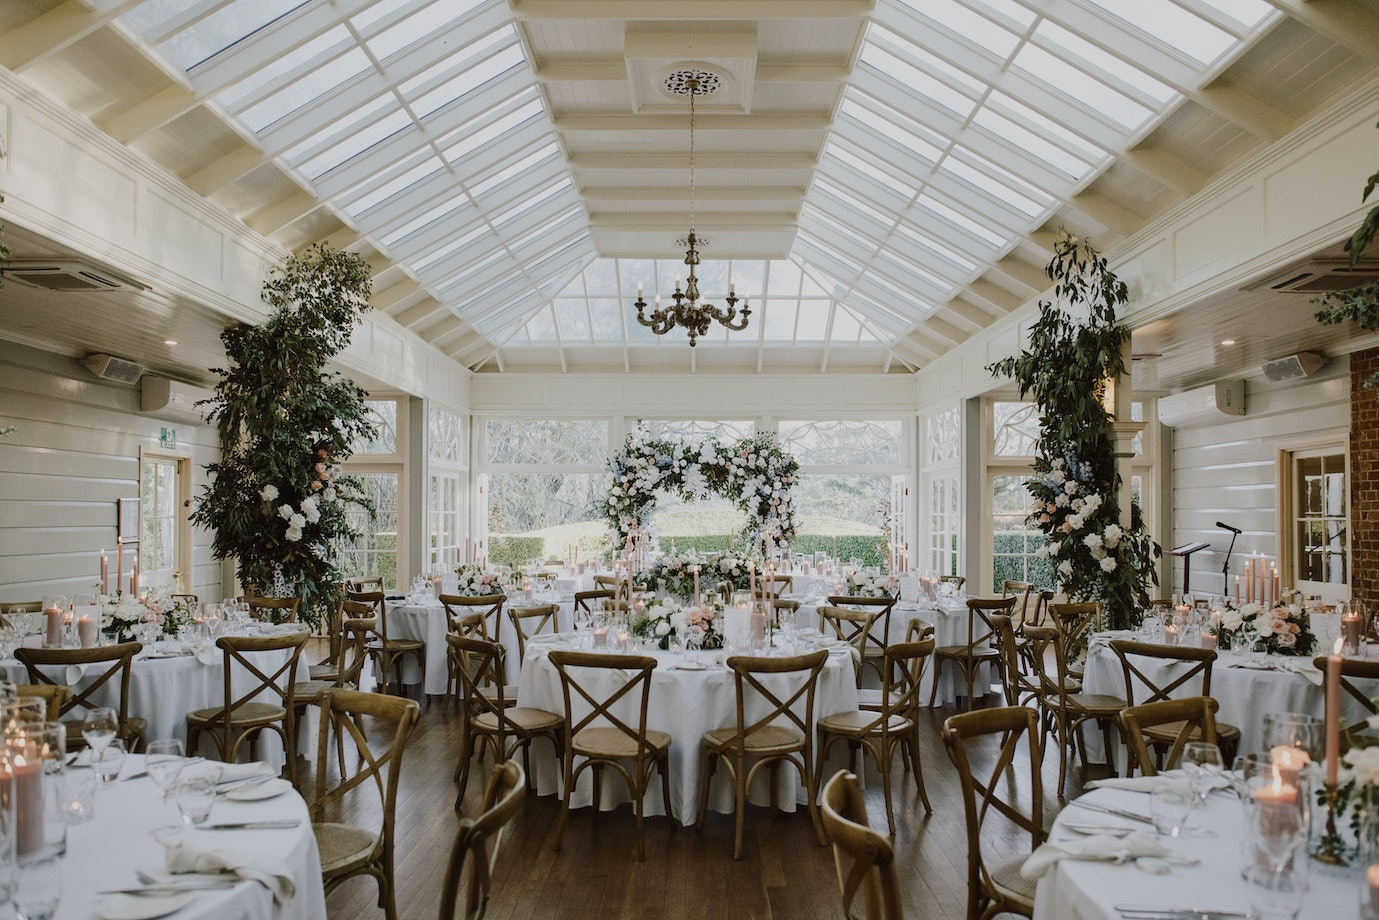 Gabbinbar Homestead conservatory set for a reception with floral arrangements